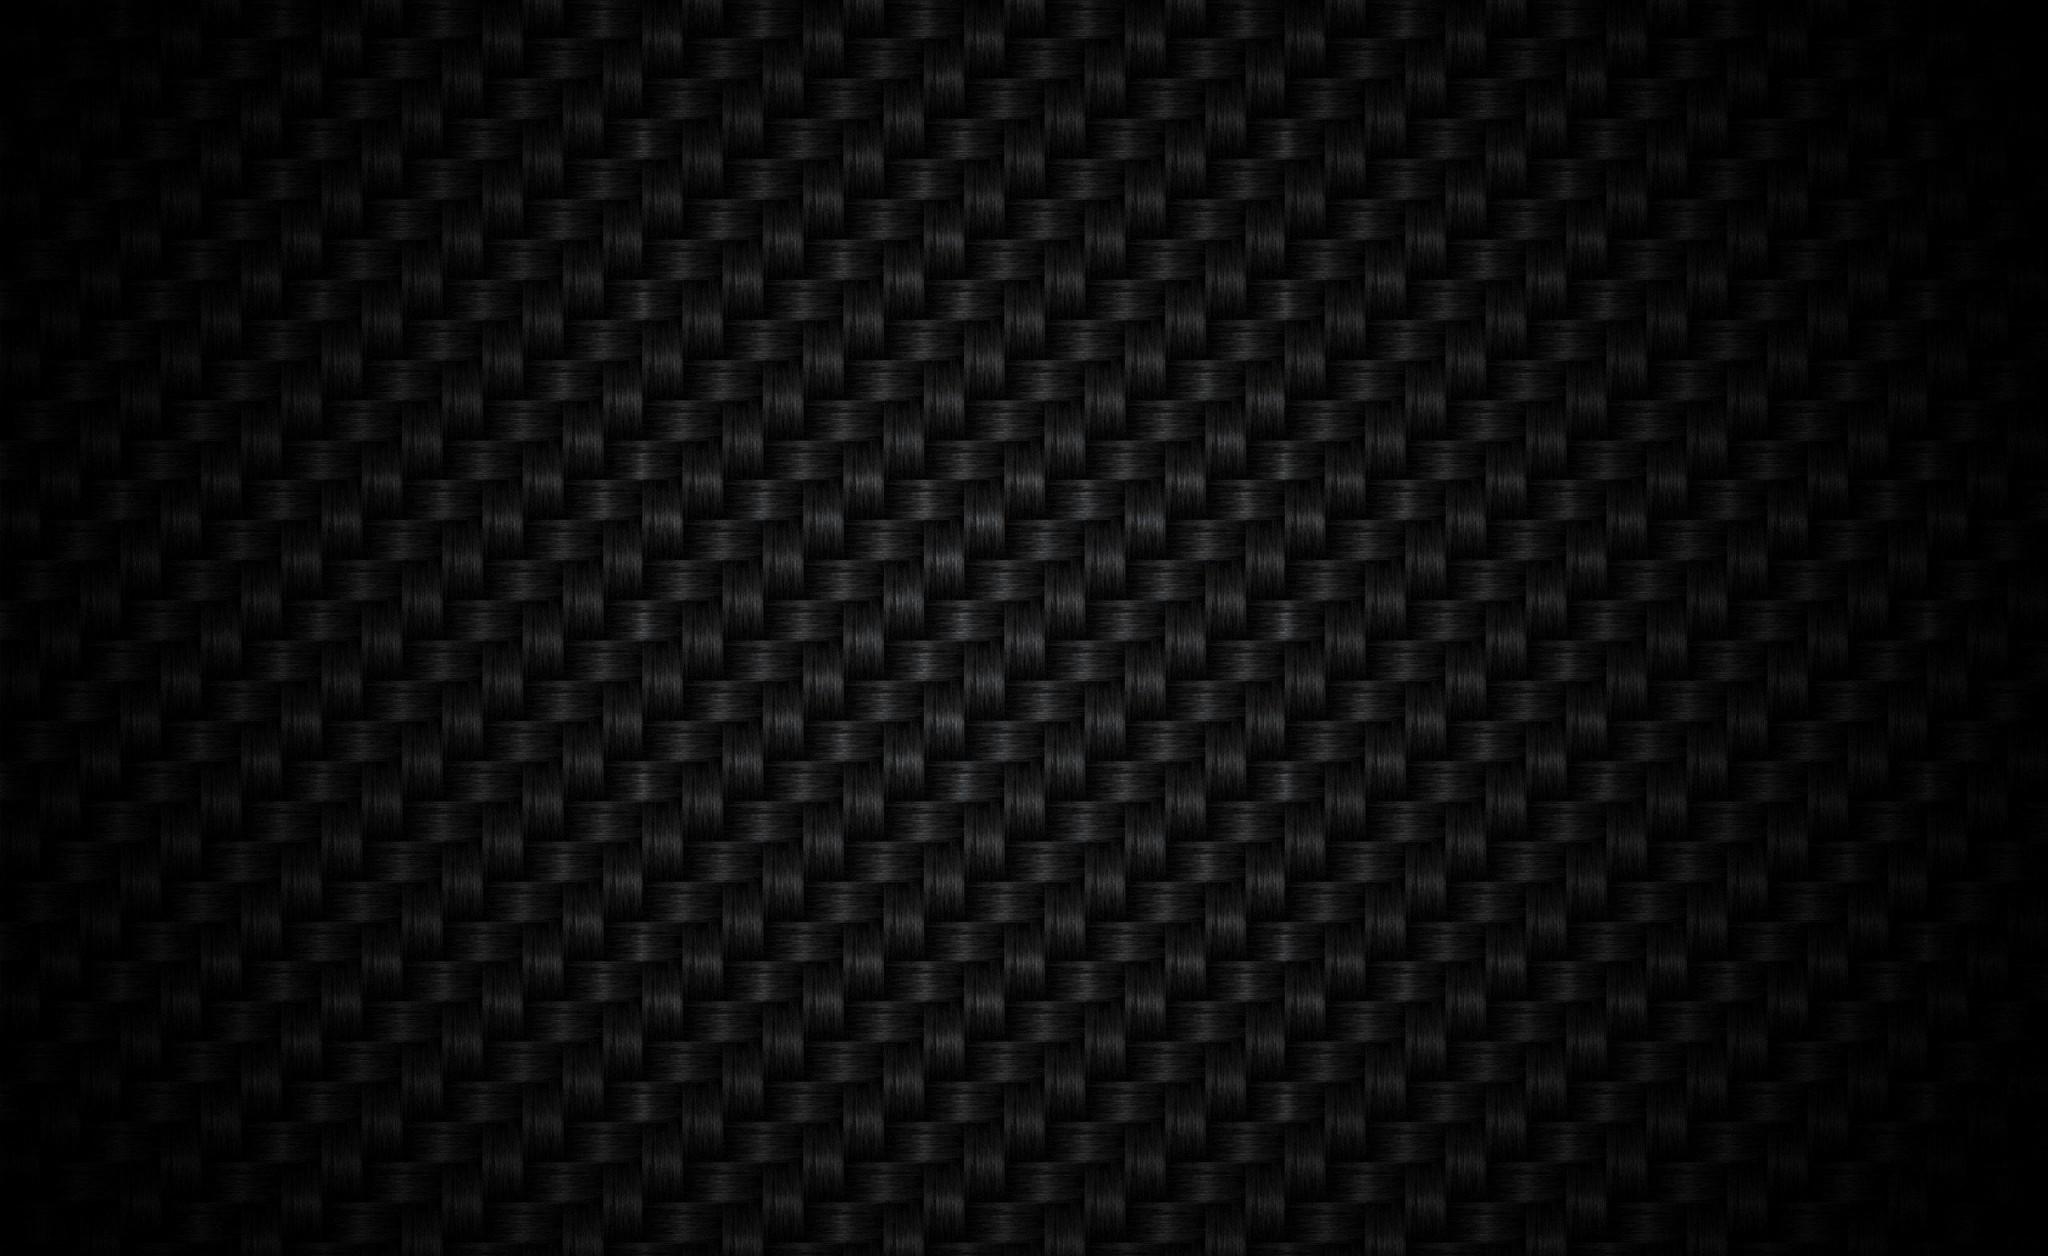 carbon fiber backgrounds images